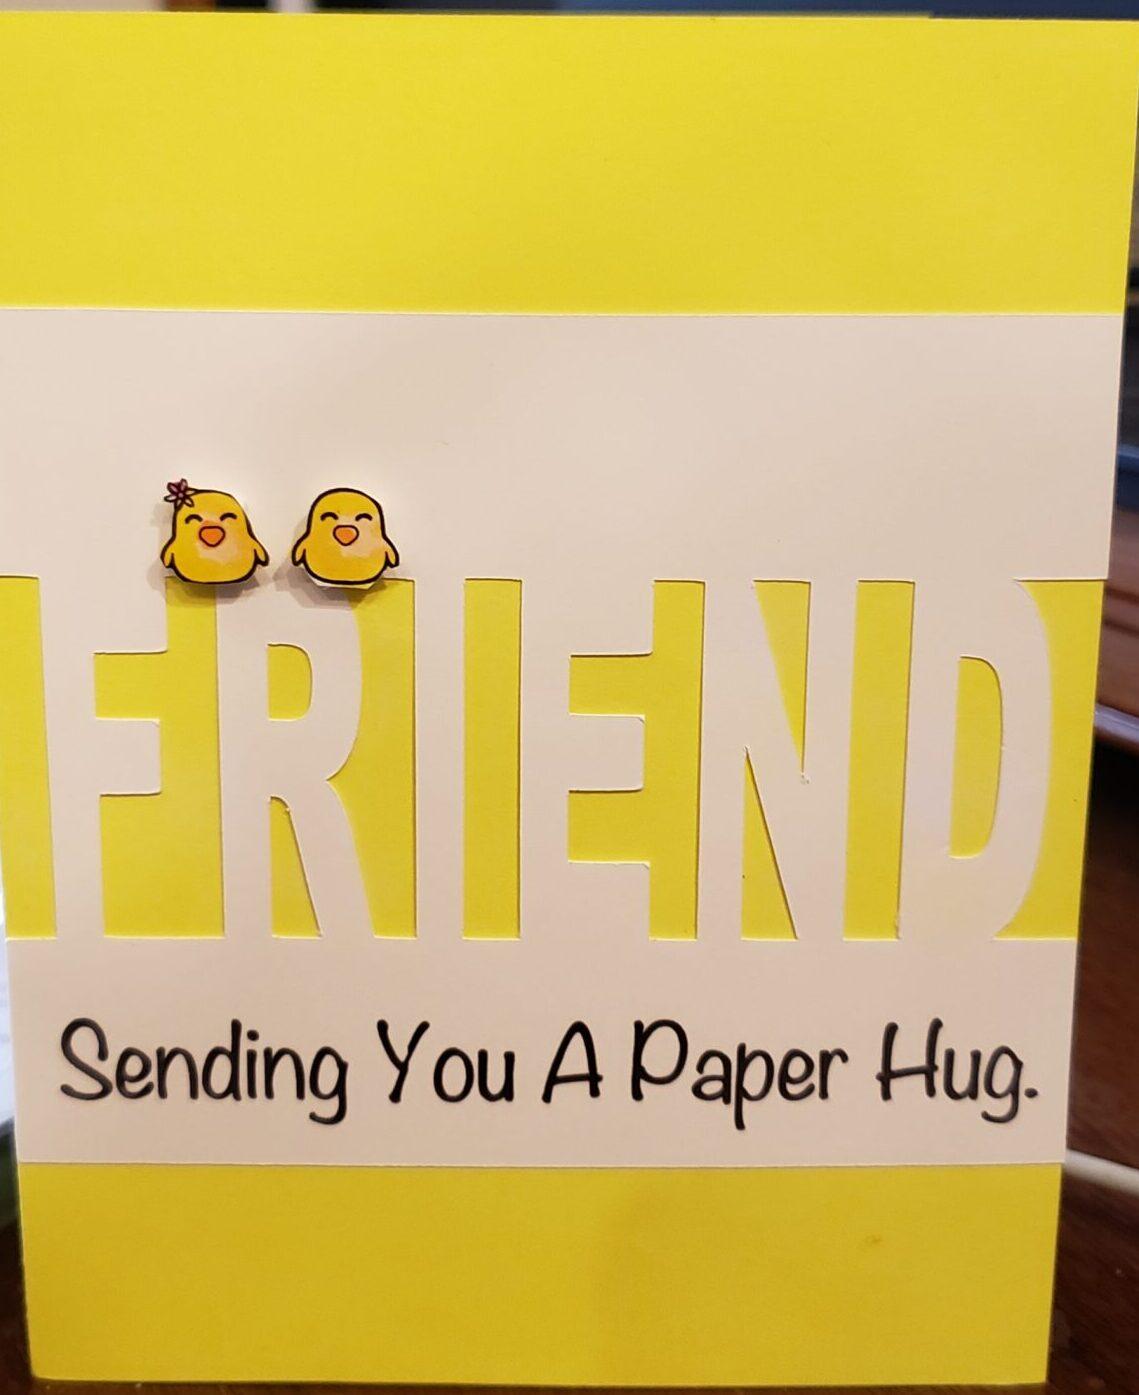 sending a paper hug